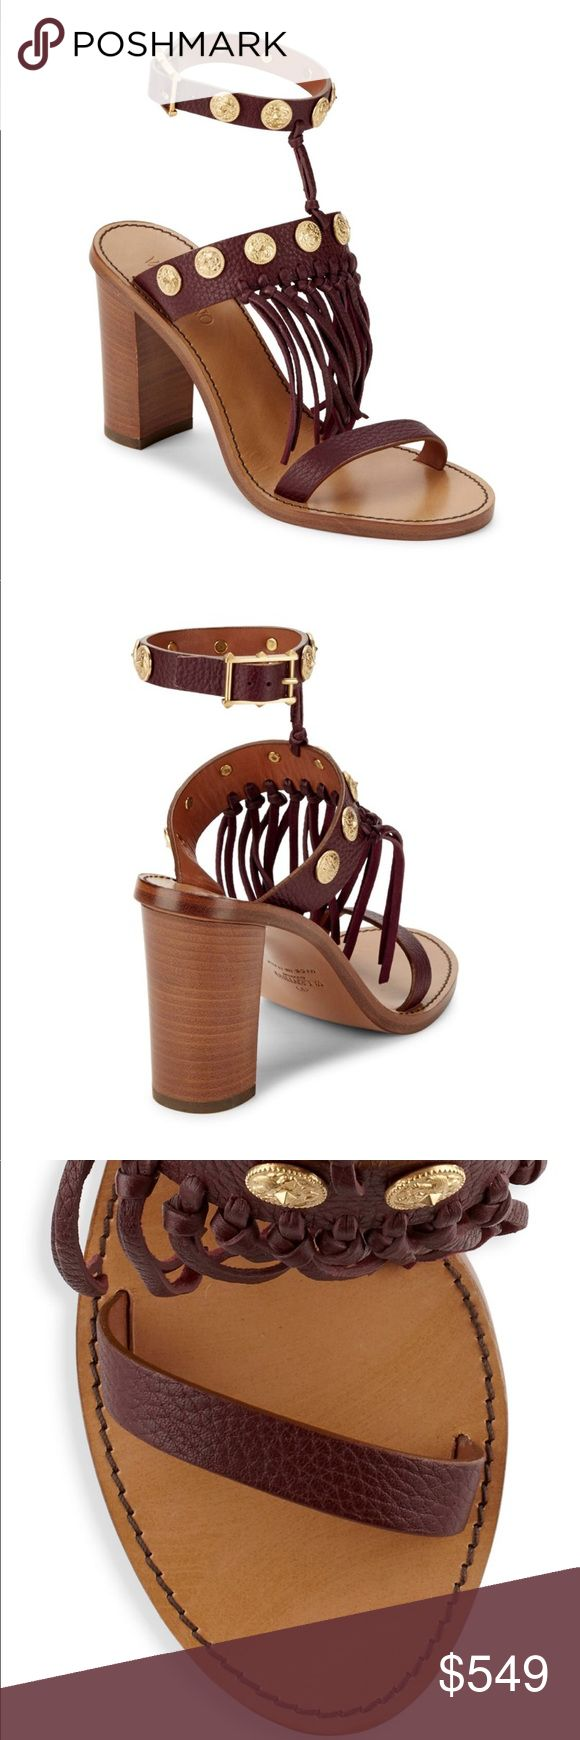 Valentino Garavani sandals Studded fringe leather ankle-wrap sandals. Fits like a size 9. Valentino Garavani Shoes Sandals